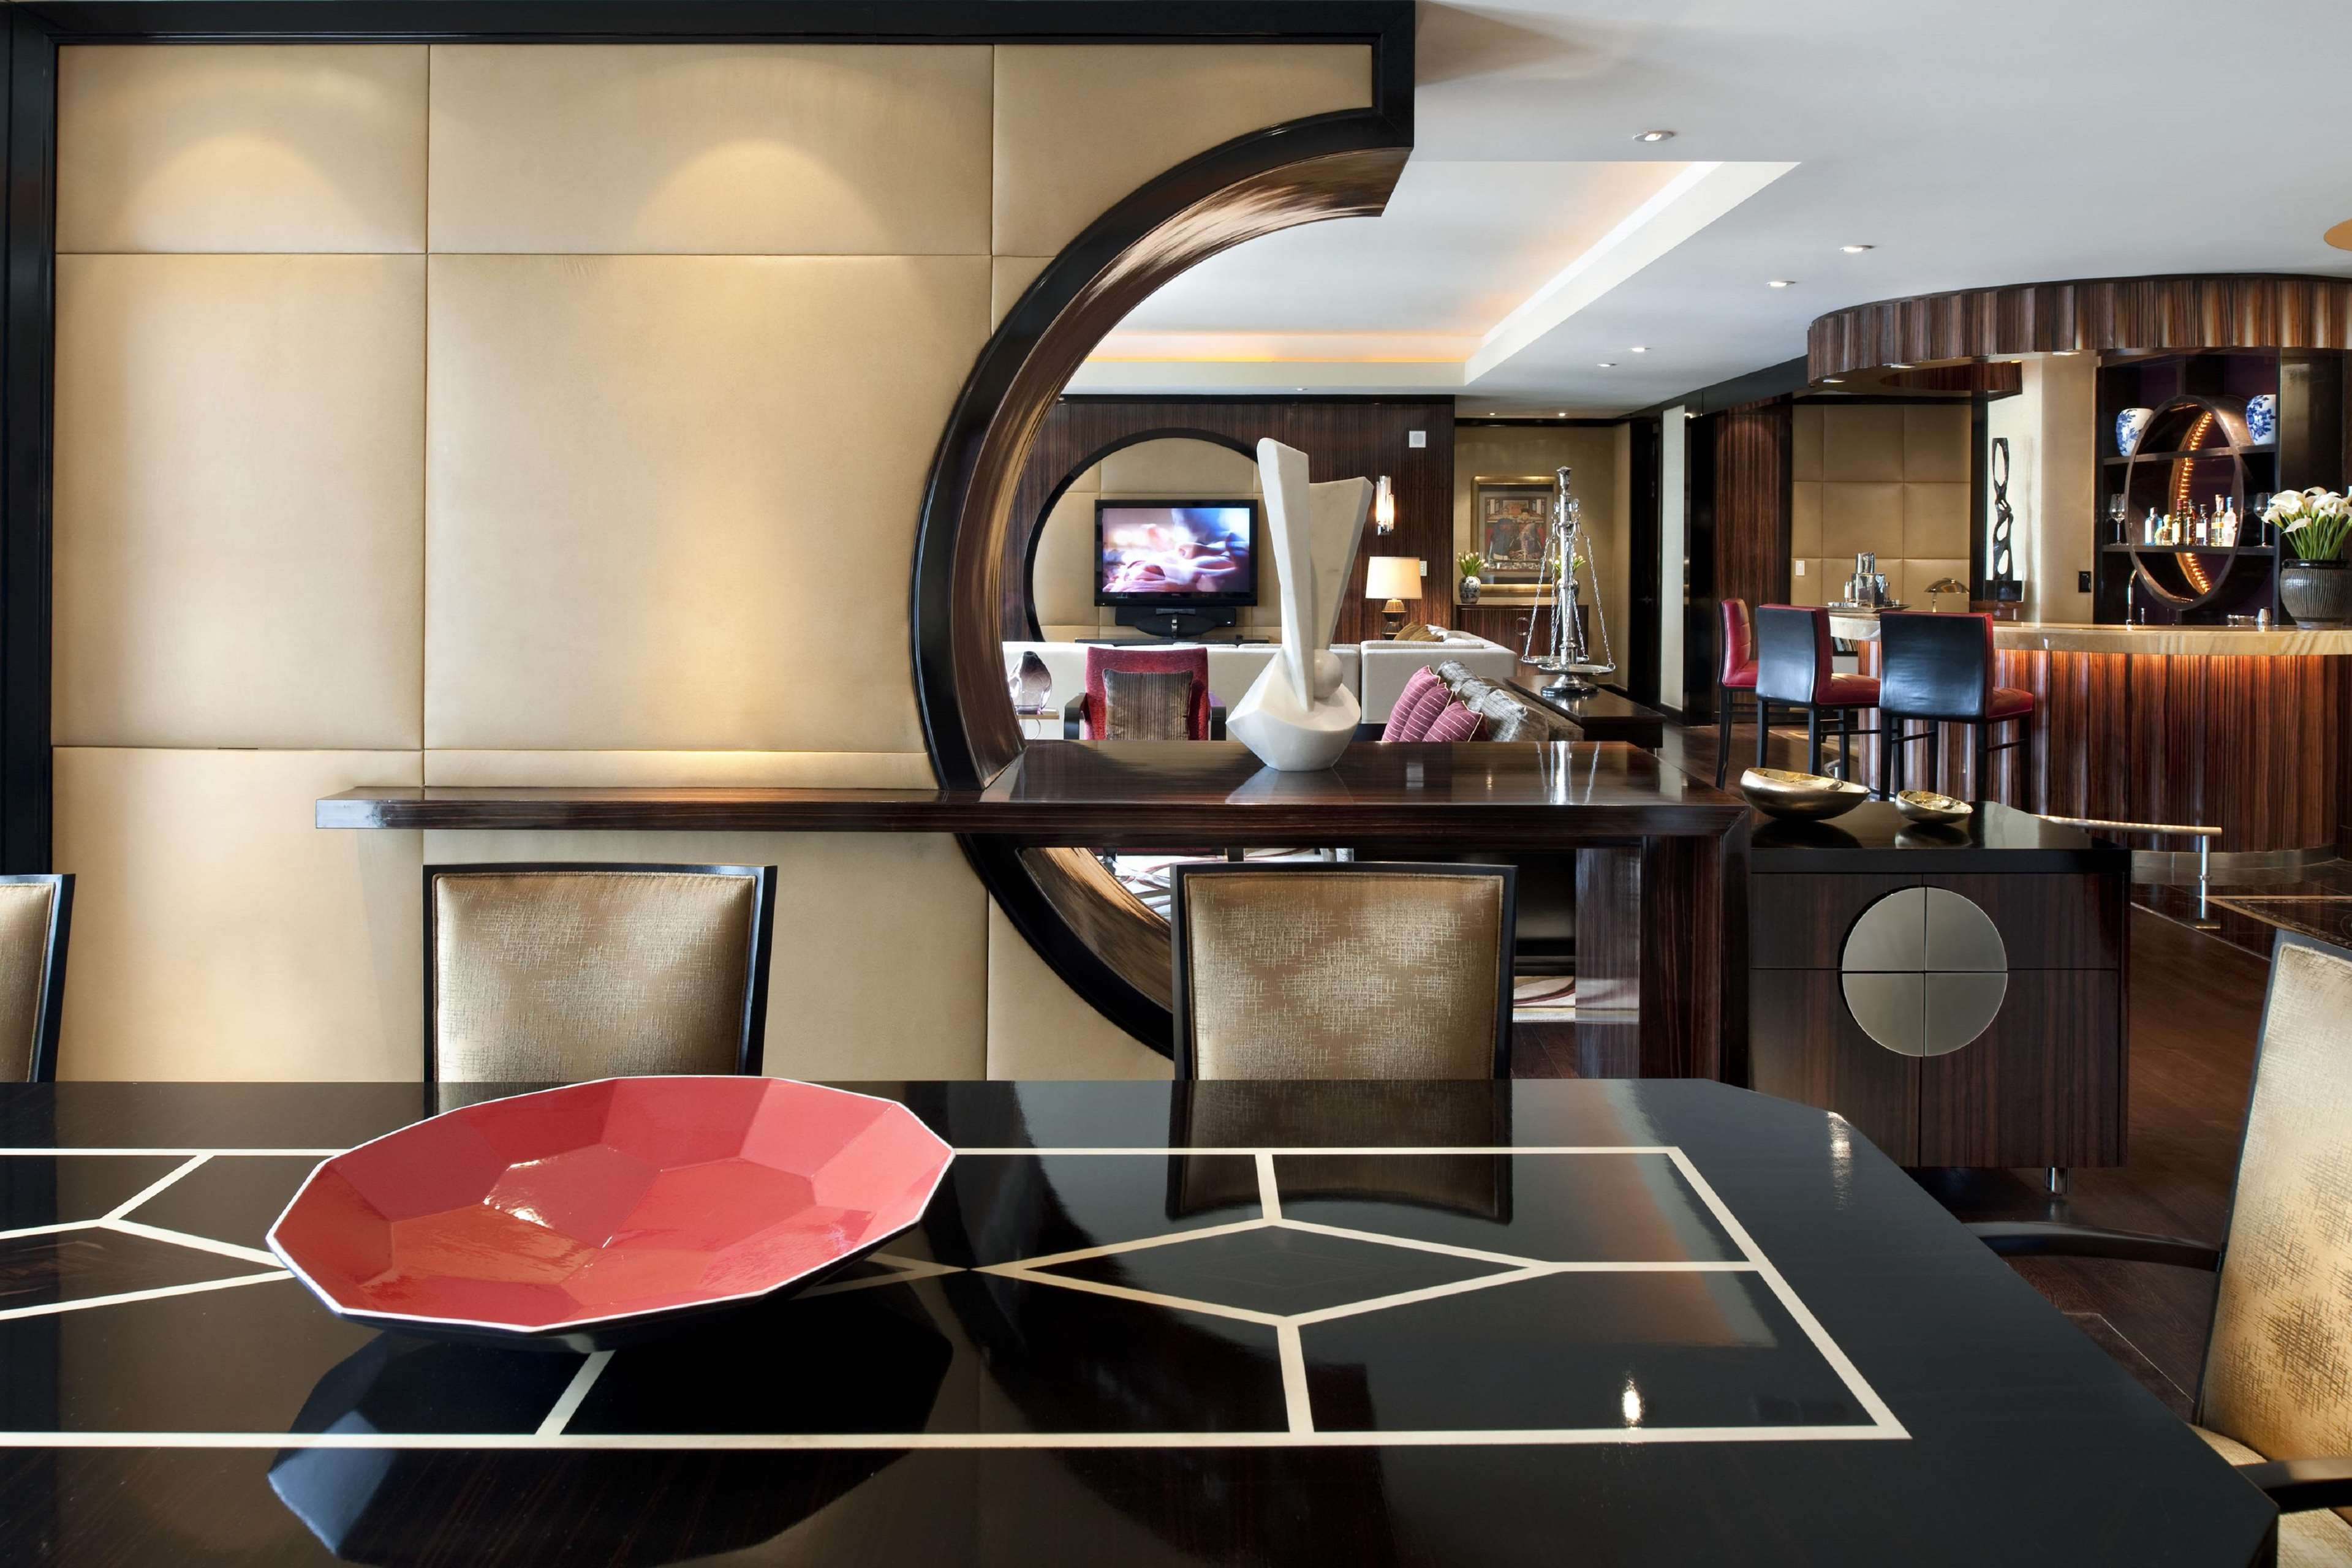 Waldorf Astoria Las Vegas image 49